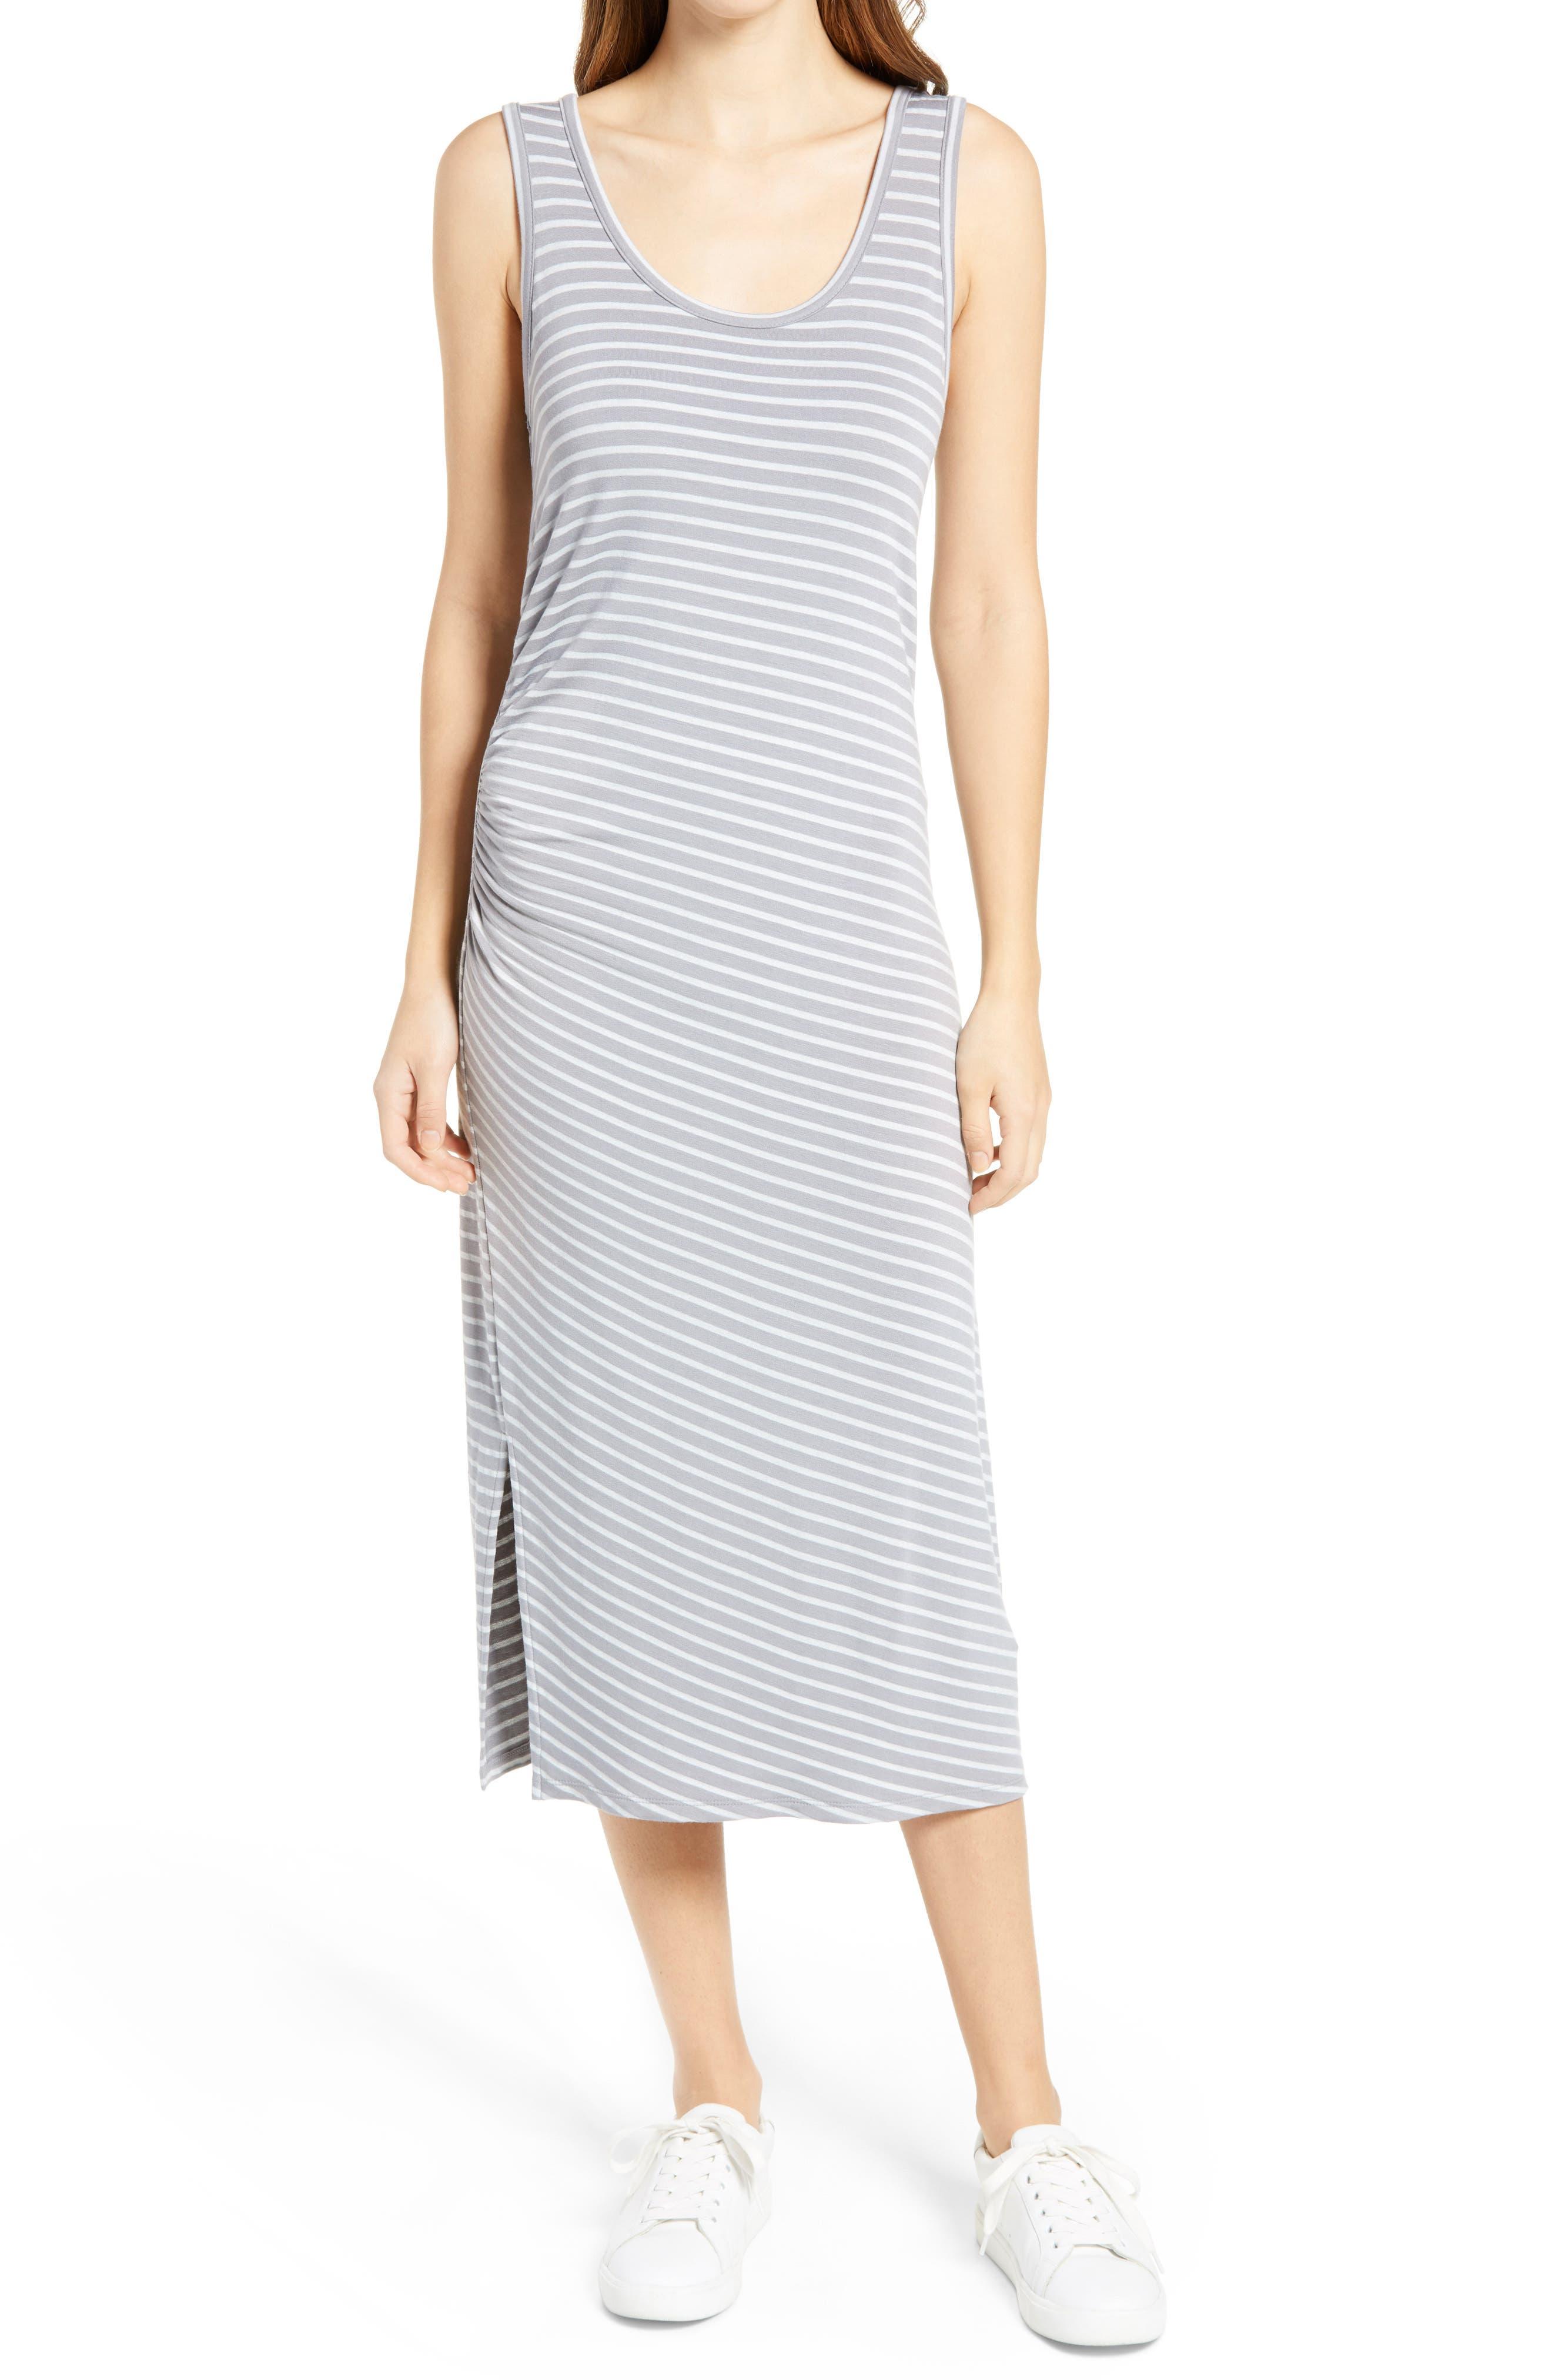 Women's Caslon Ruched Sleeveless Midi Tank Dress